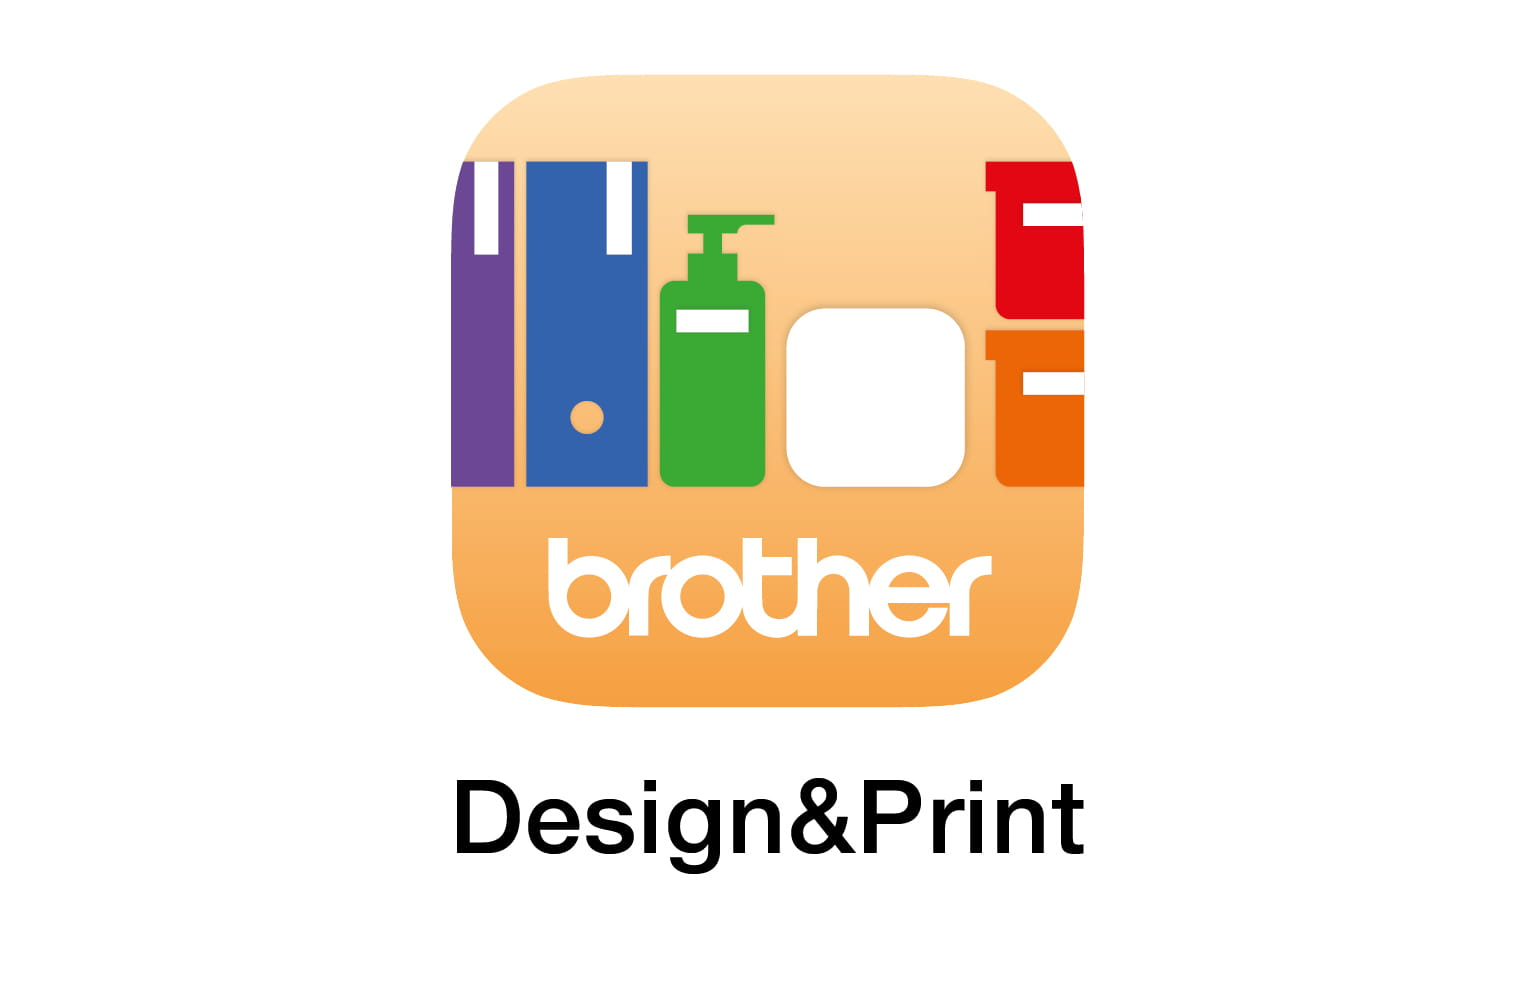 Brother Design&Print App